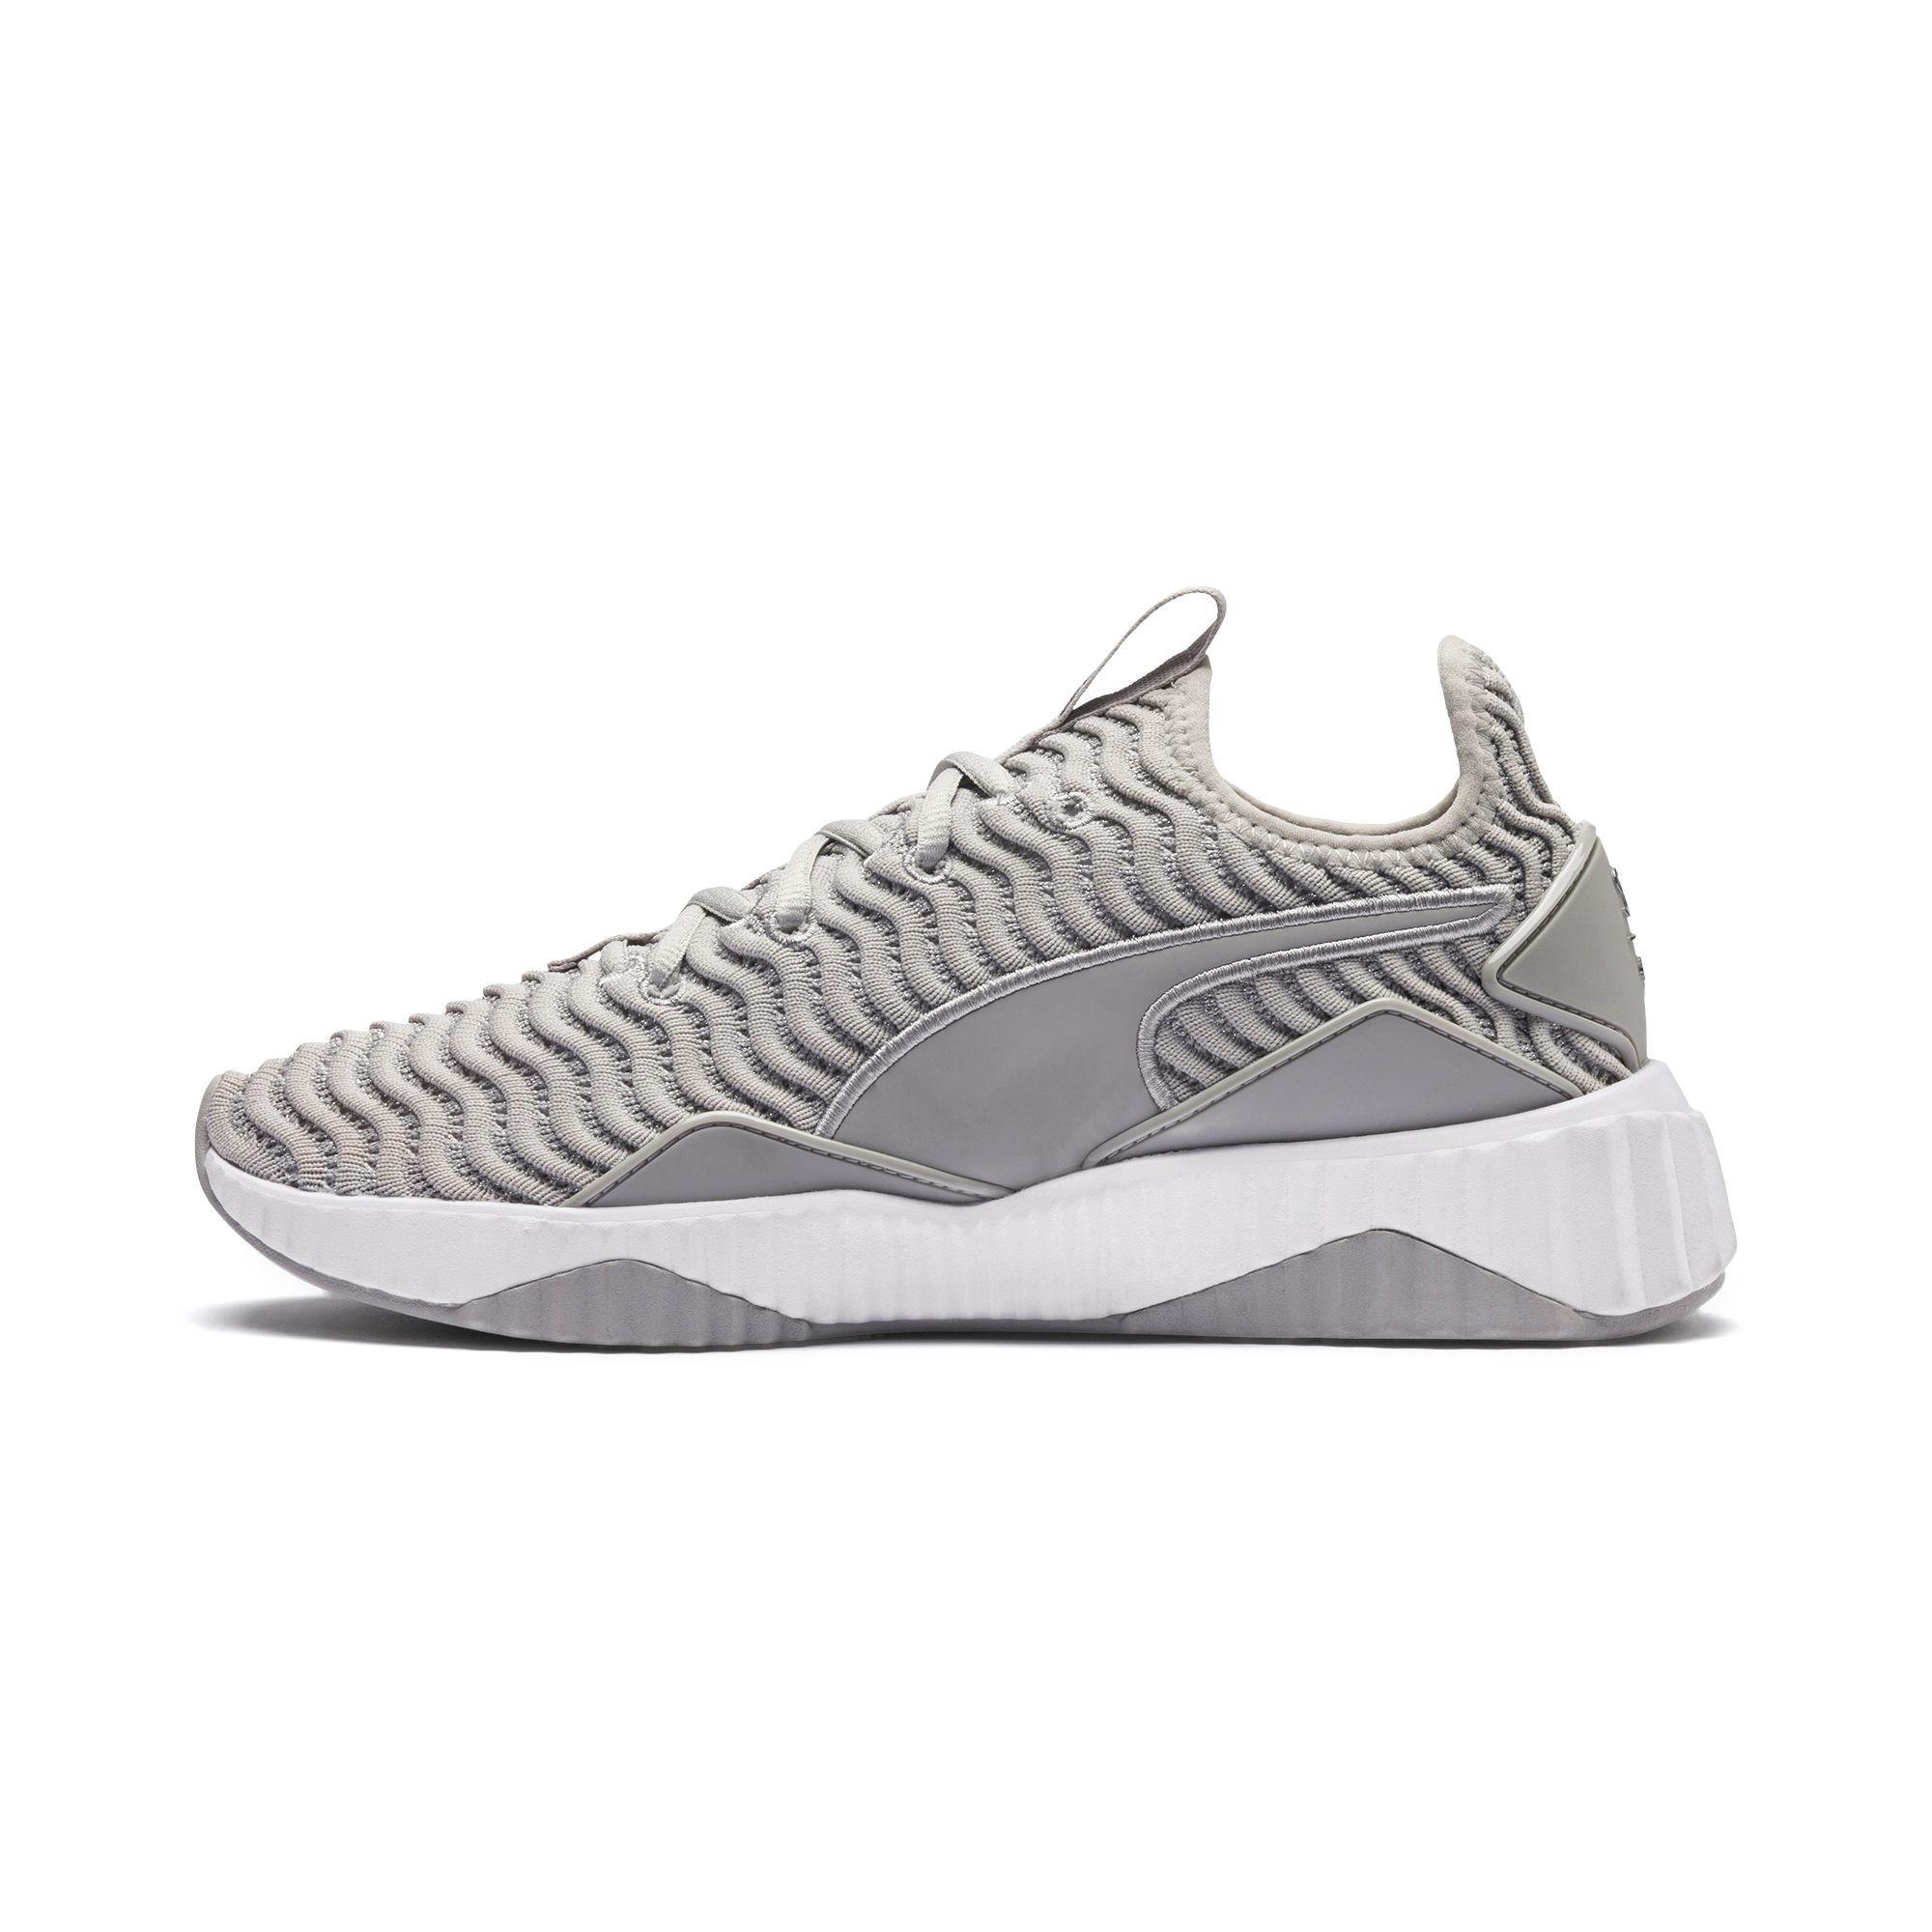 6a6b709588 PUMA Multicolor Sg X Defy Women's Sneakers